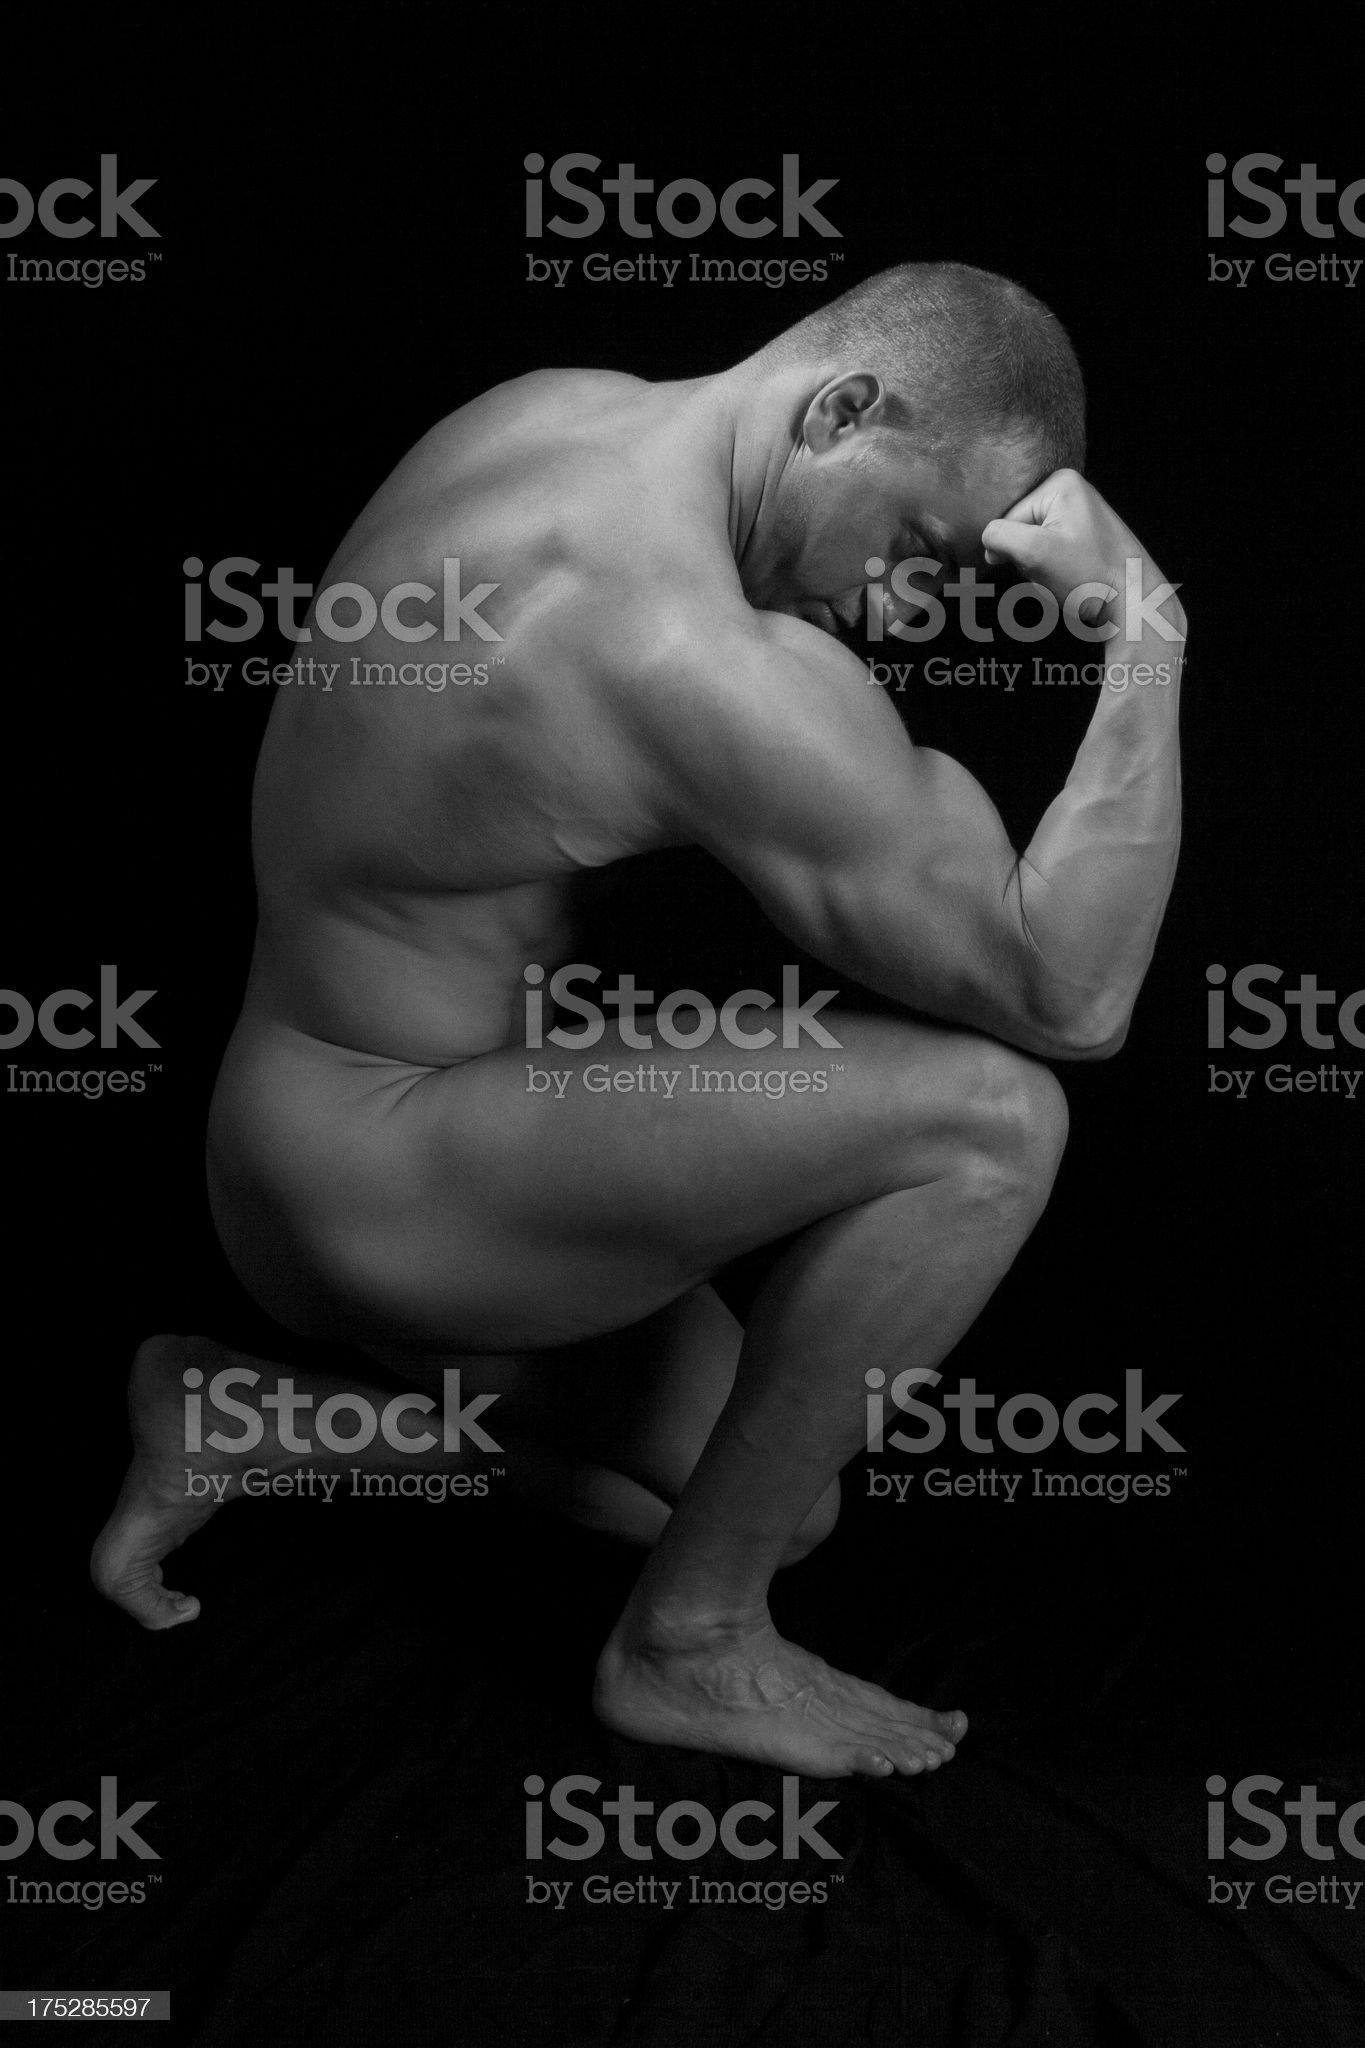 male figure study royalty-free stock photo